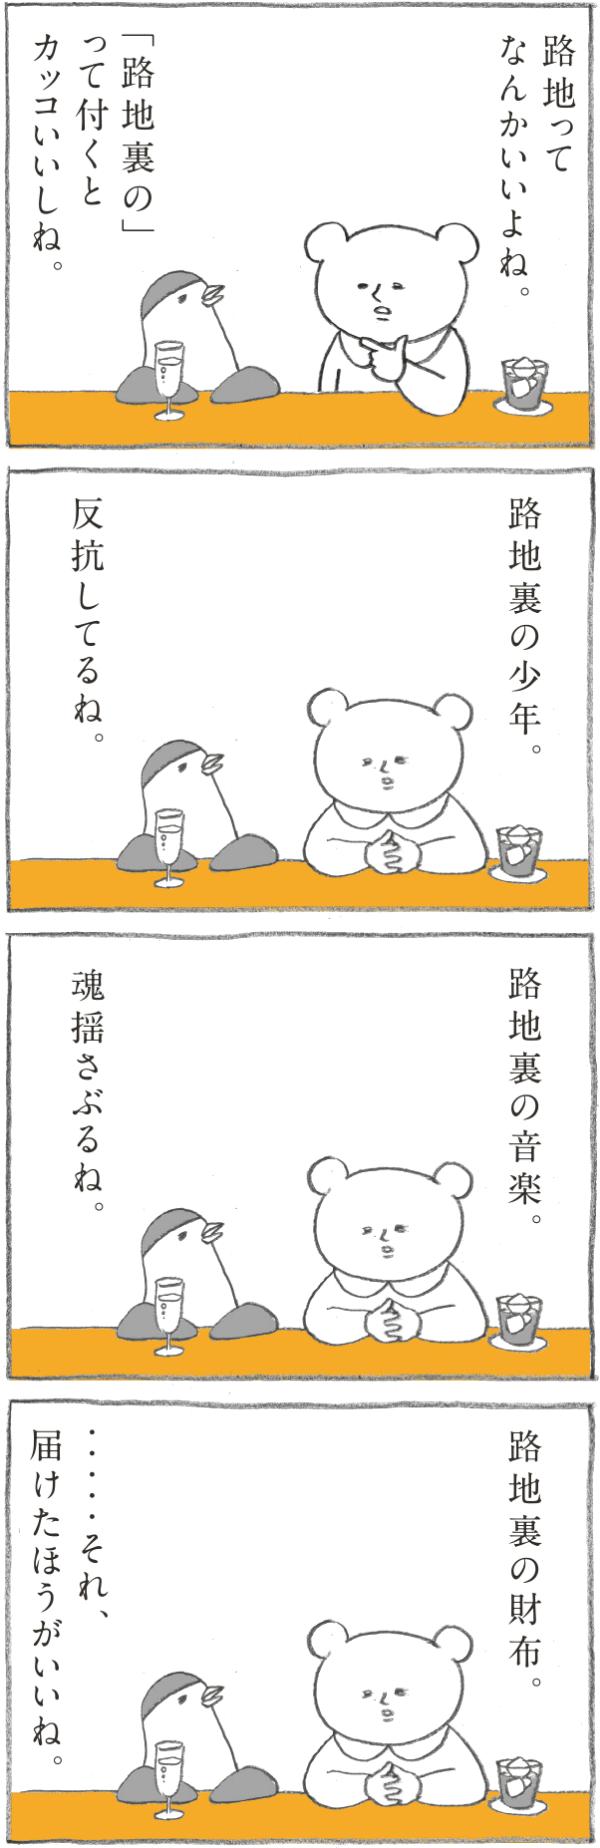 Hanako 1170号:おかわり自由